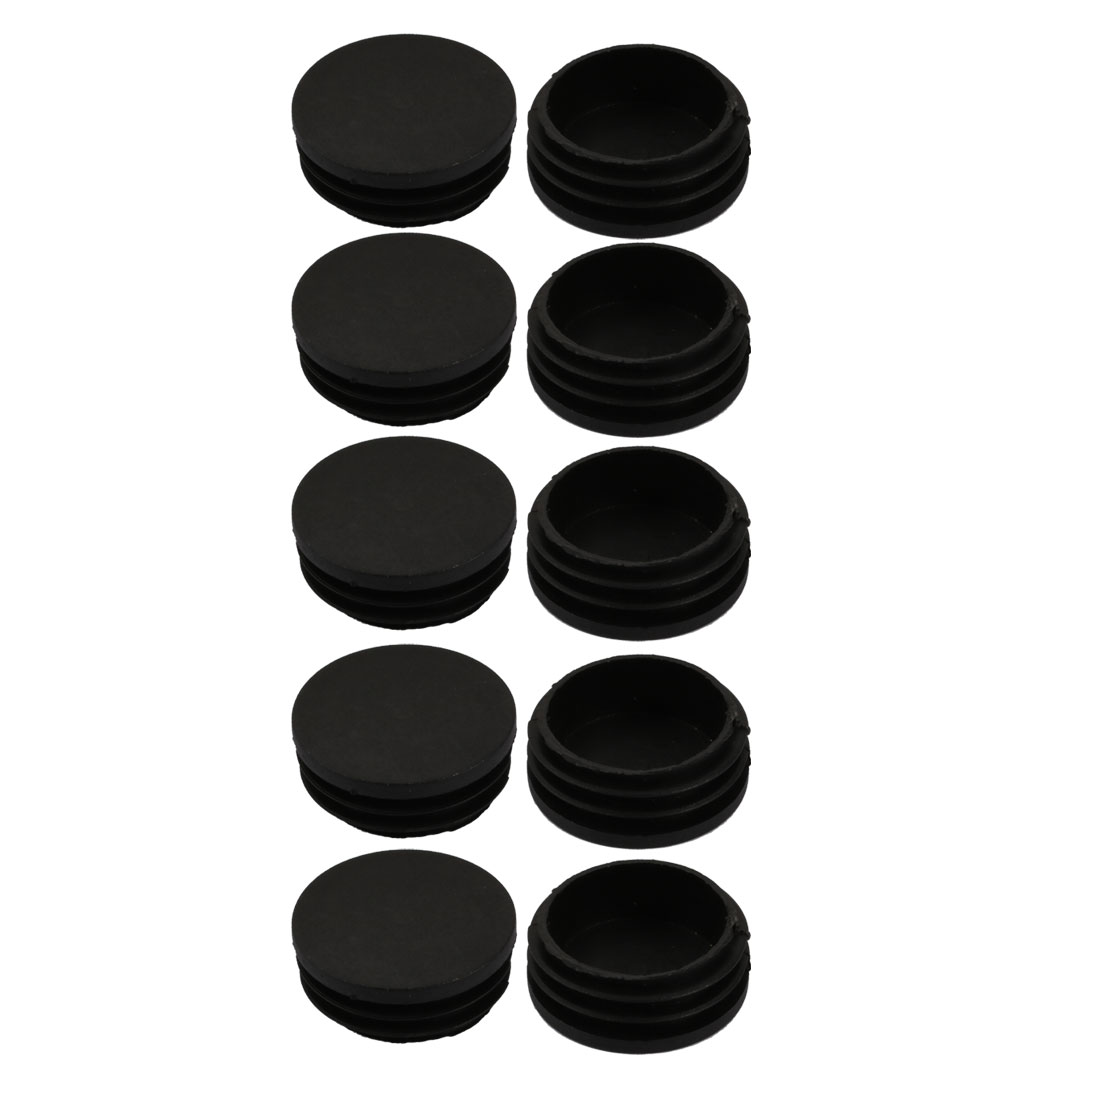 10pcs 47mm Diameter Tube Insert Chair Leg Cap Round Black Plastic Tubing Plug